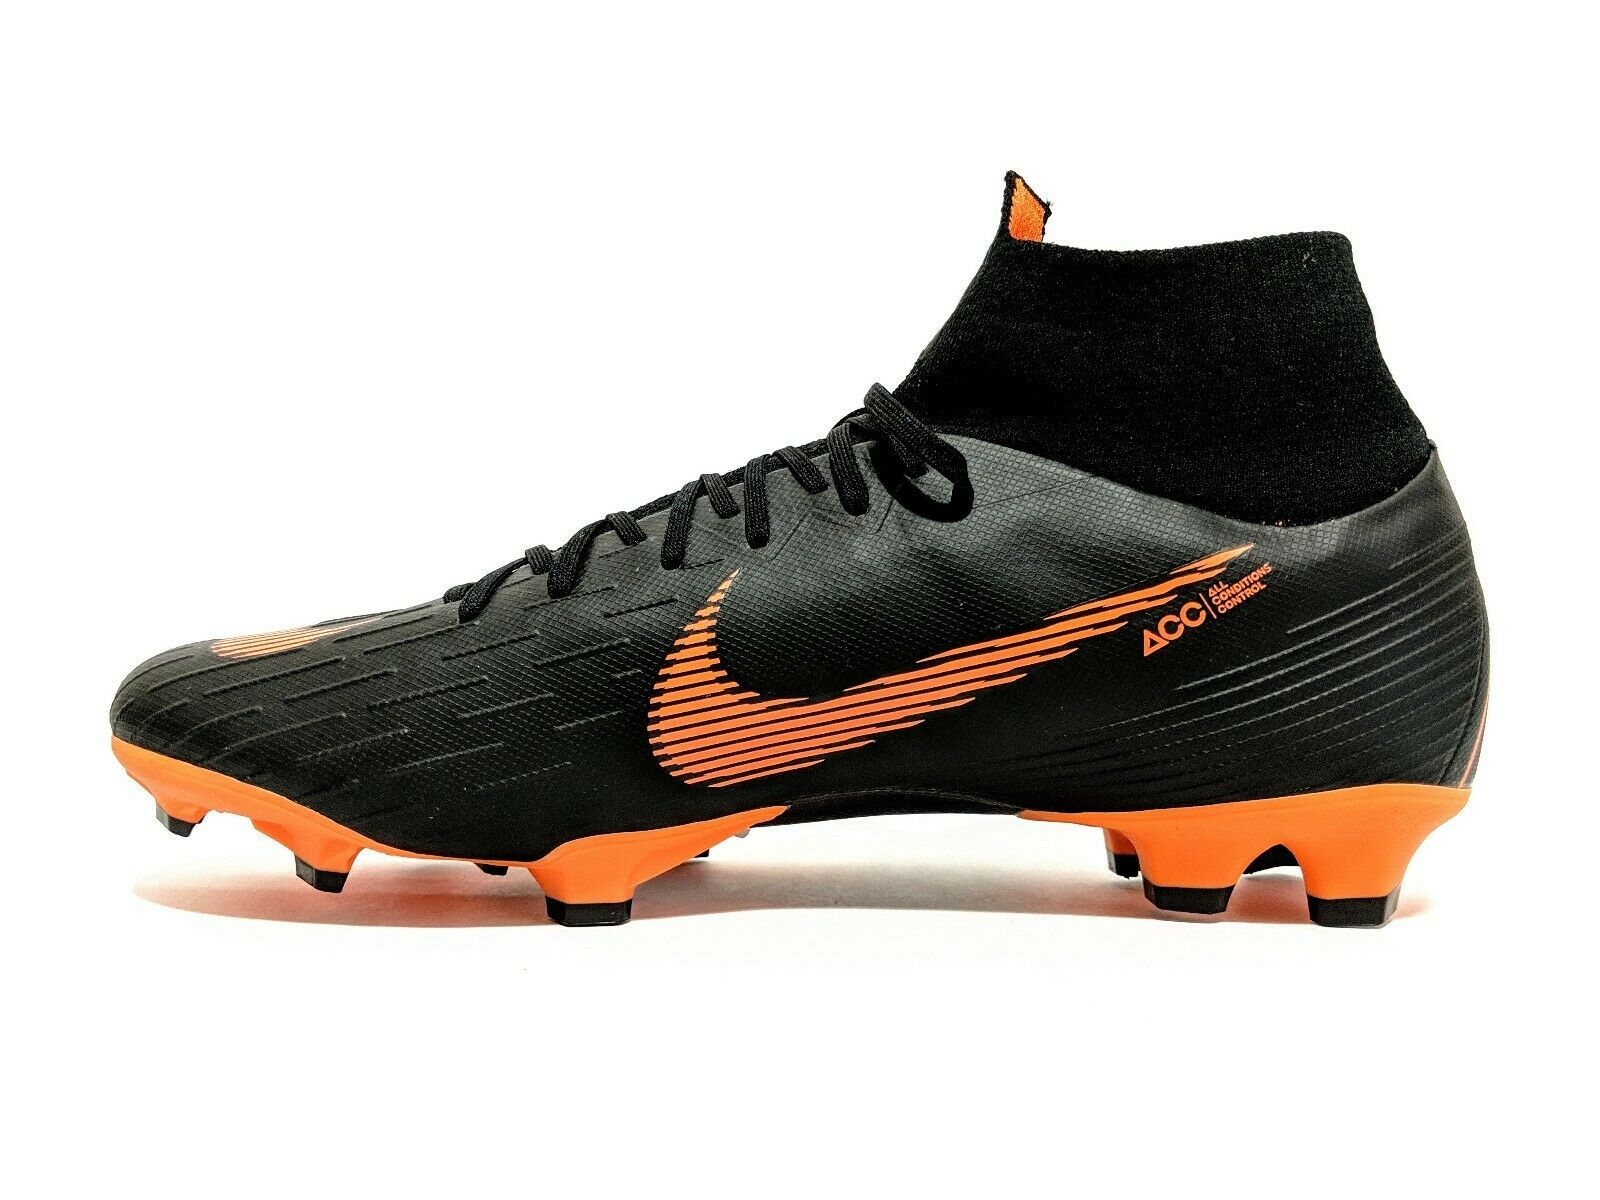 Nike Superfly 6 Pro FG Soccer Cleats Black orange [AH7368-081] Men's Size 12